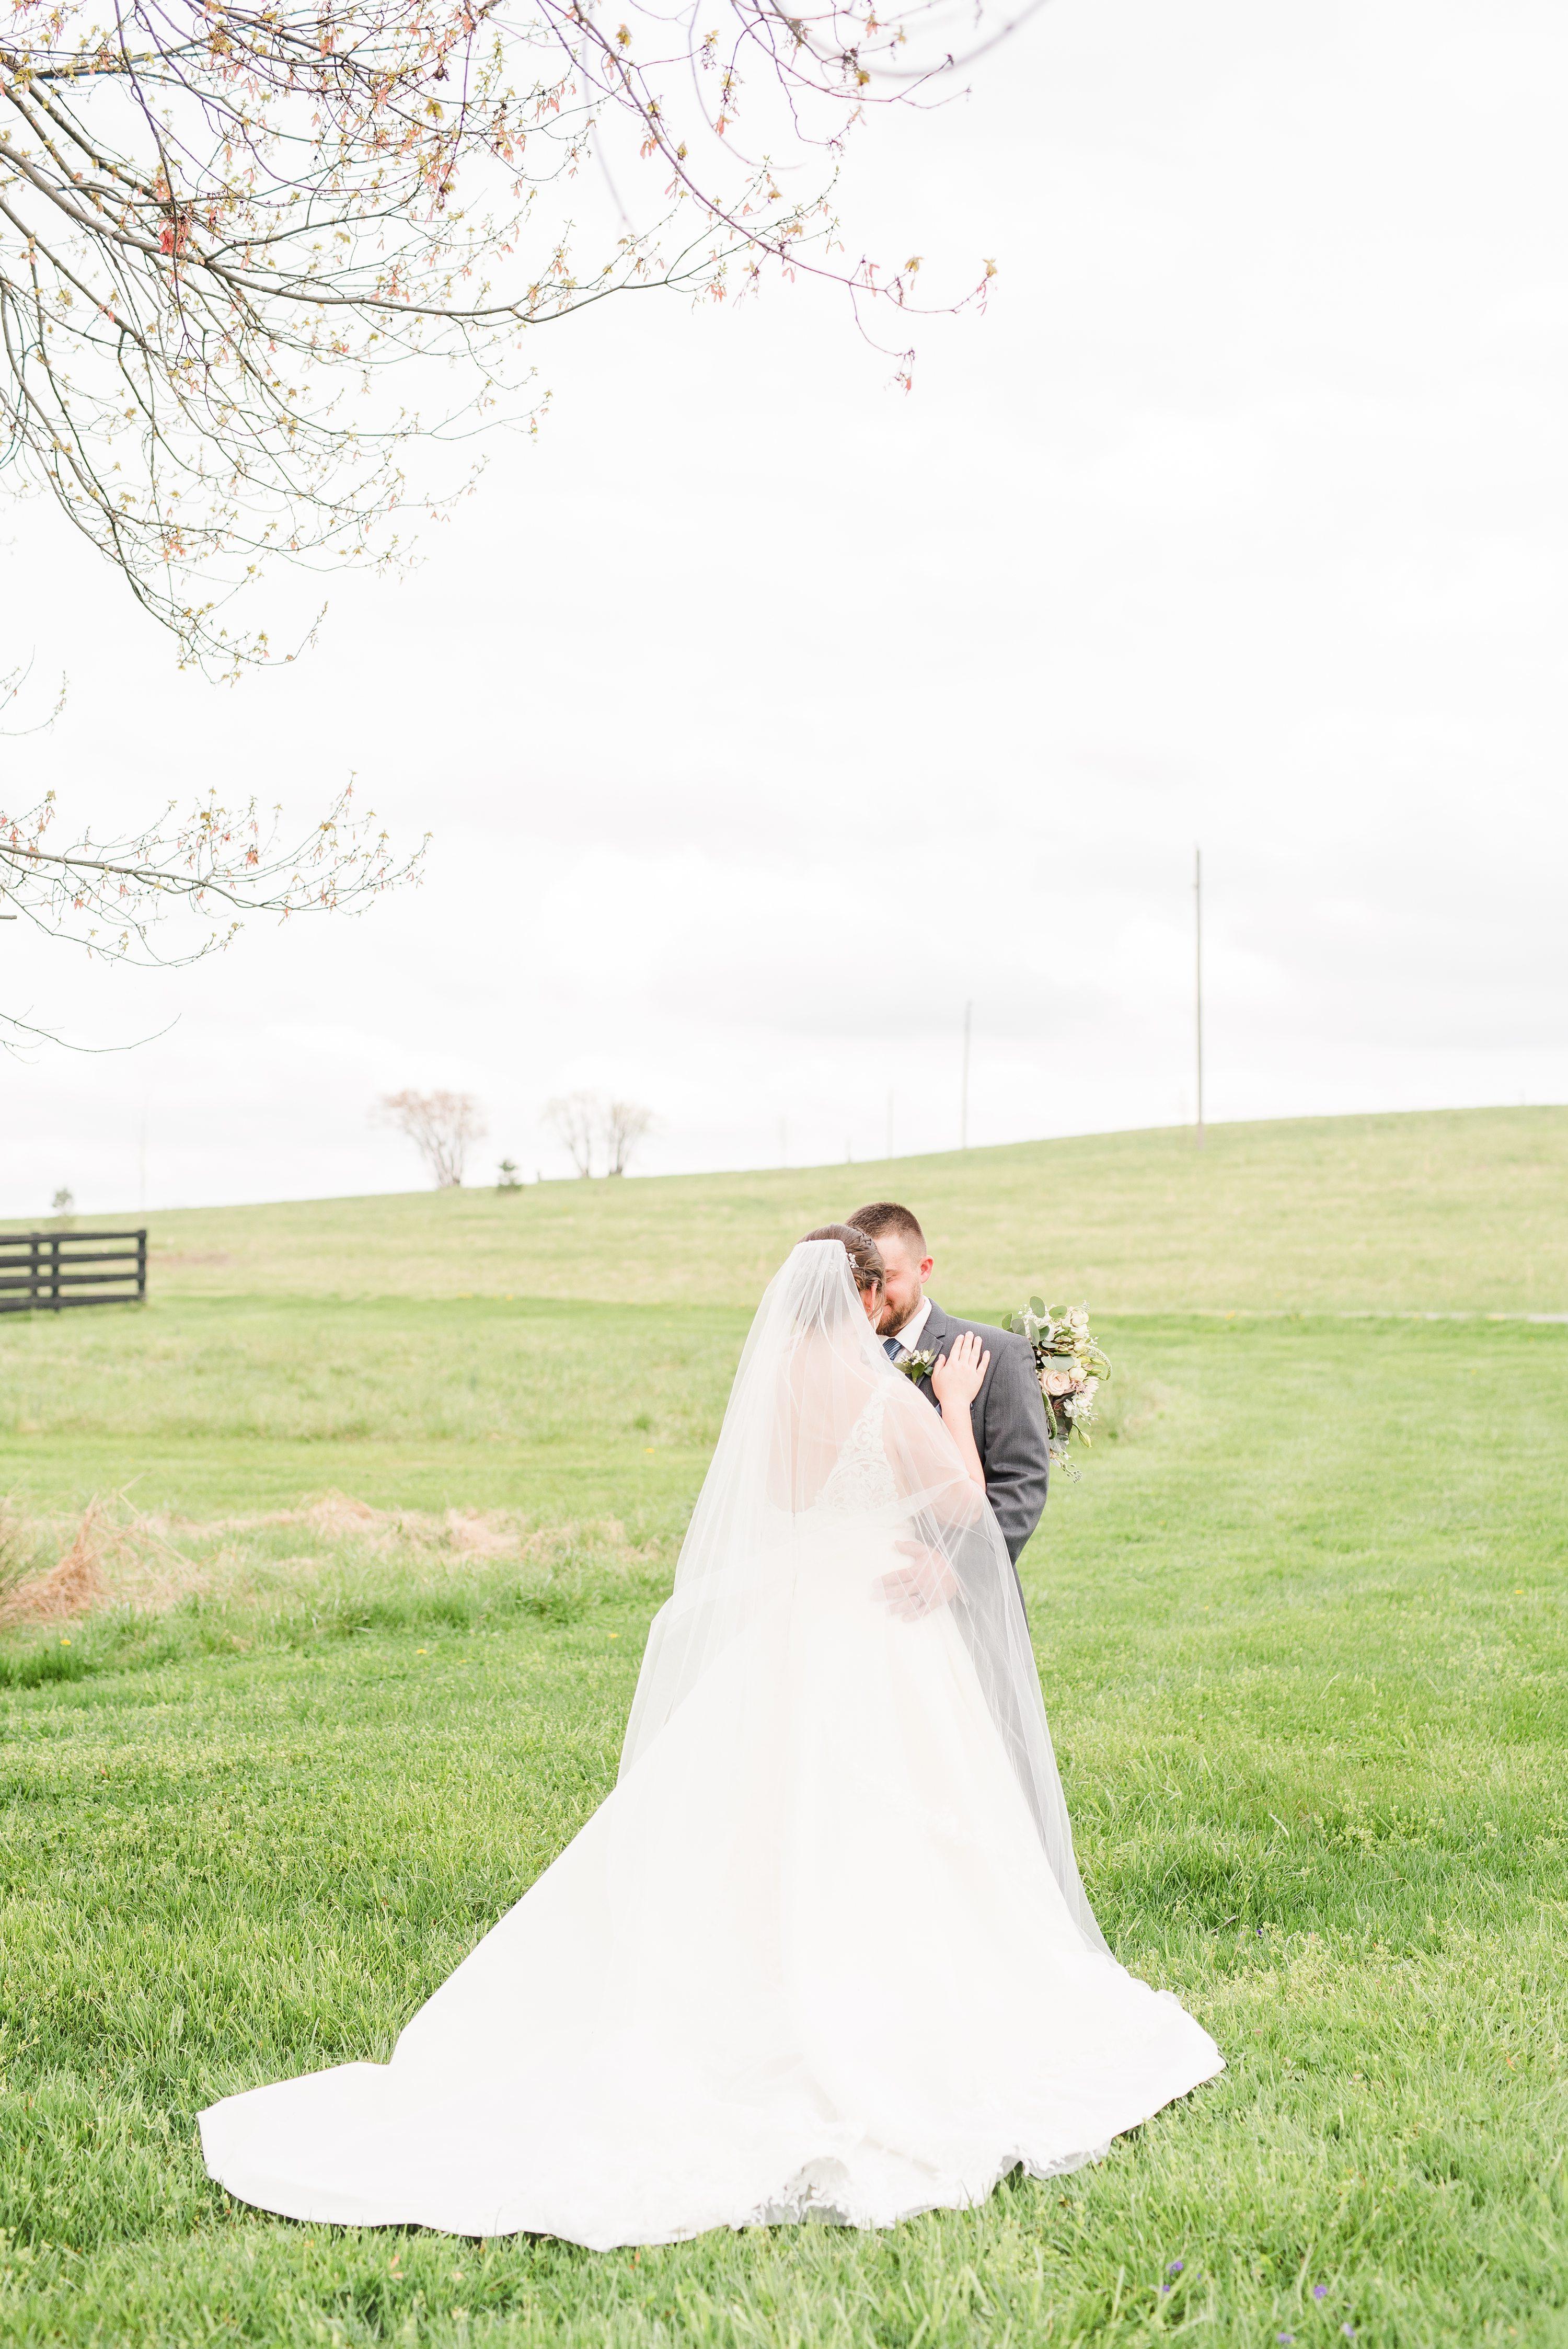 Blue Ridge Mountains,Edgewood,bride and groom,mountain wedding,edgewood barn